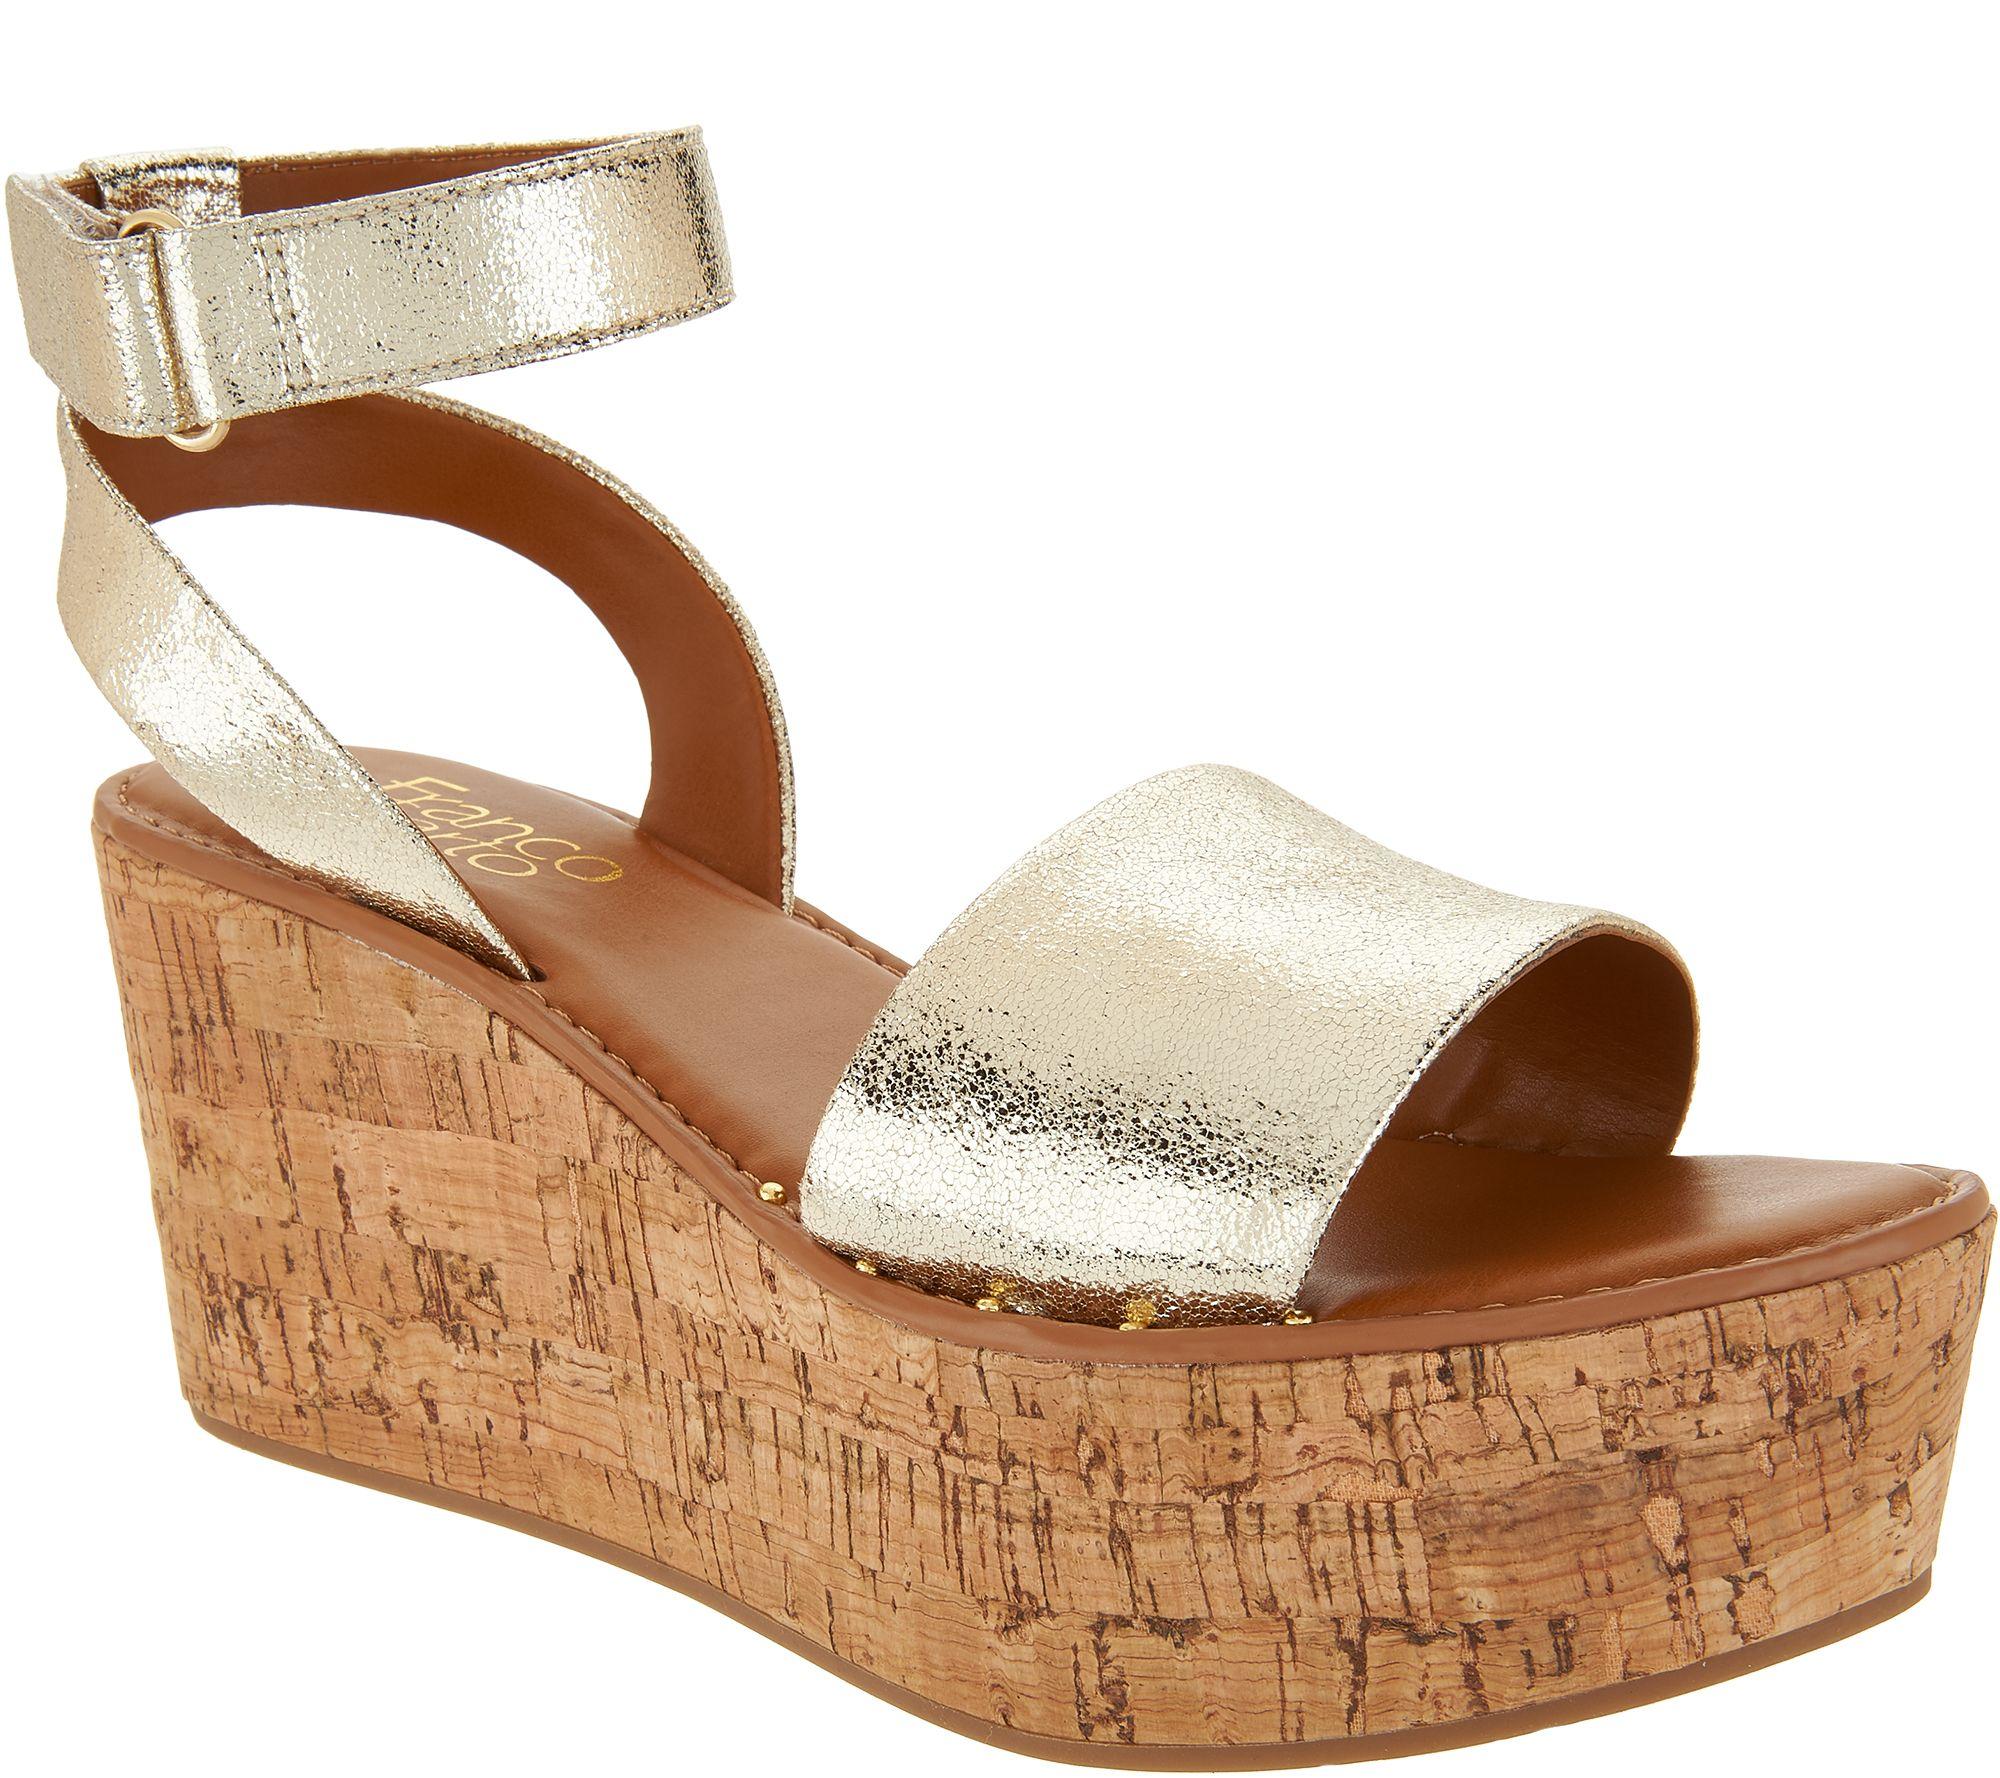 501d46792799 Franco Sarto Ankle Strap Wedges - Jovie - Page 1 — QVC.com